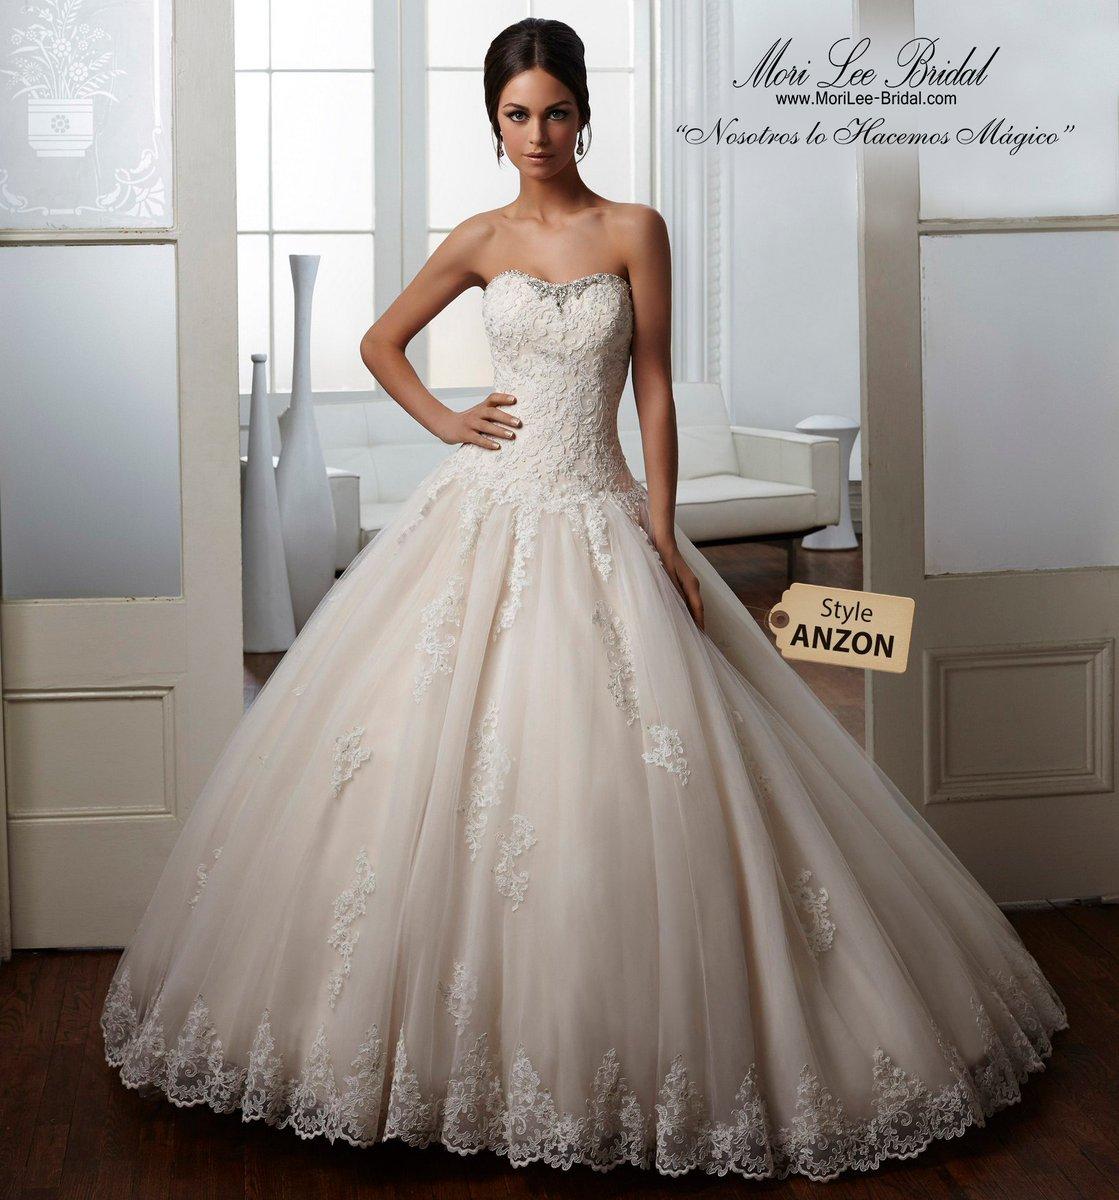 Mori lee bridal vestidos de novia peru